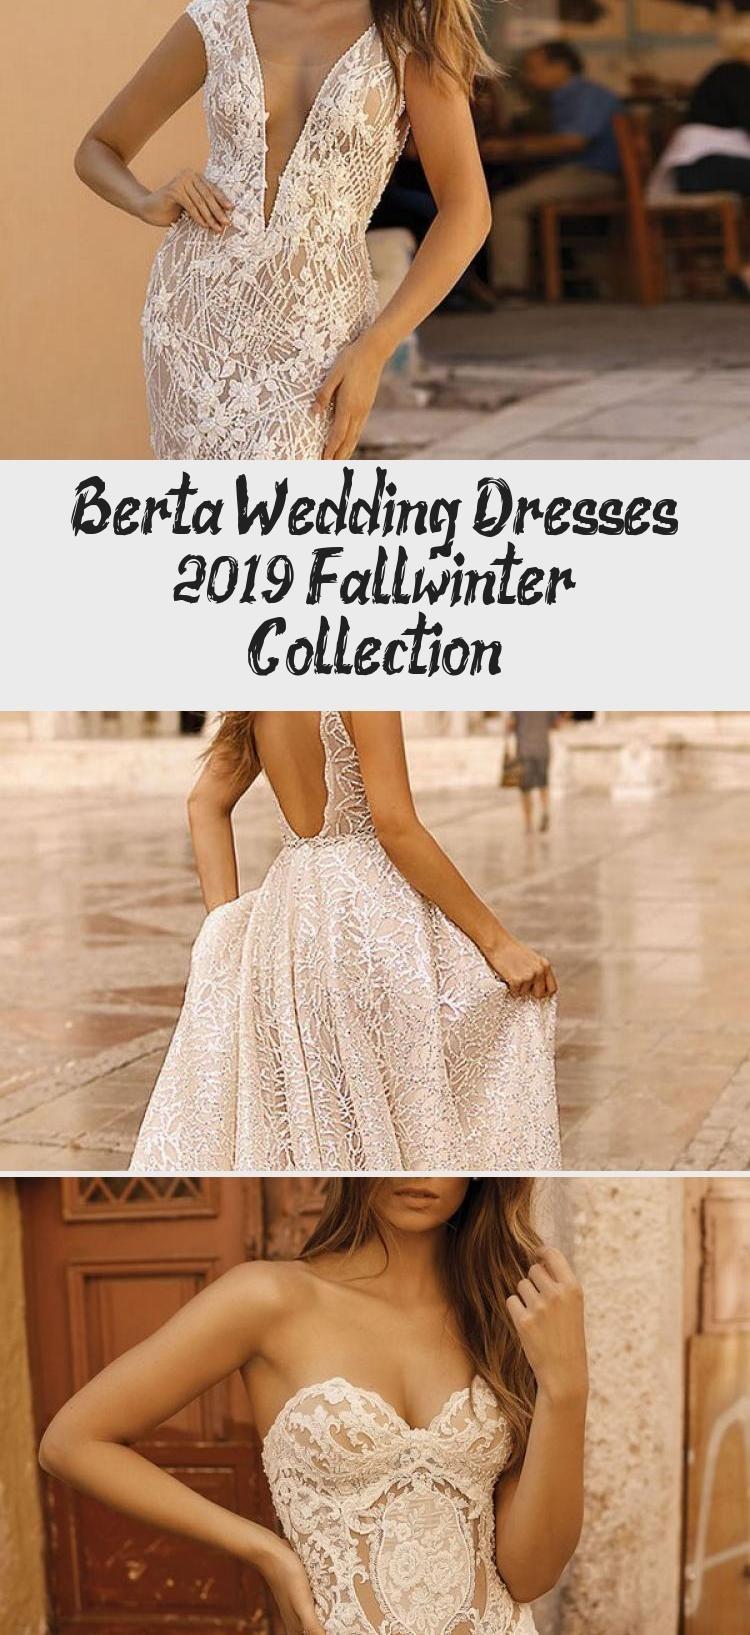 Berta Wedding Dresses 2019 Fall/winter Collection #bertaweddingdress